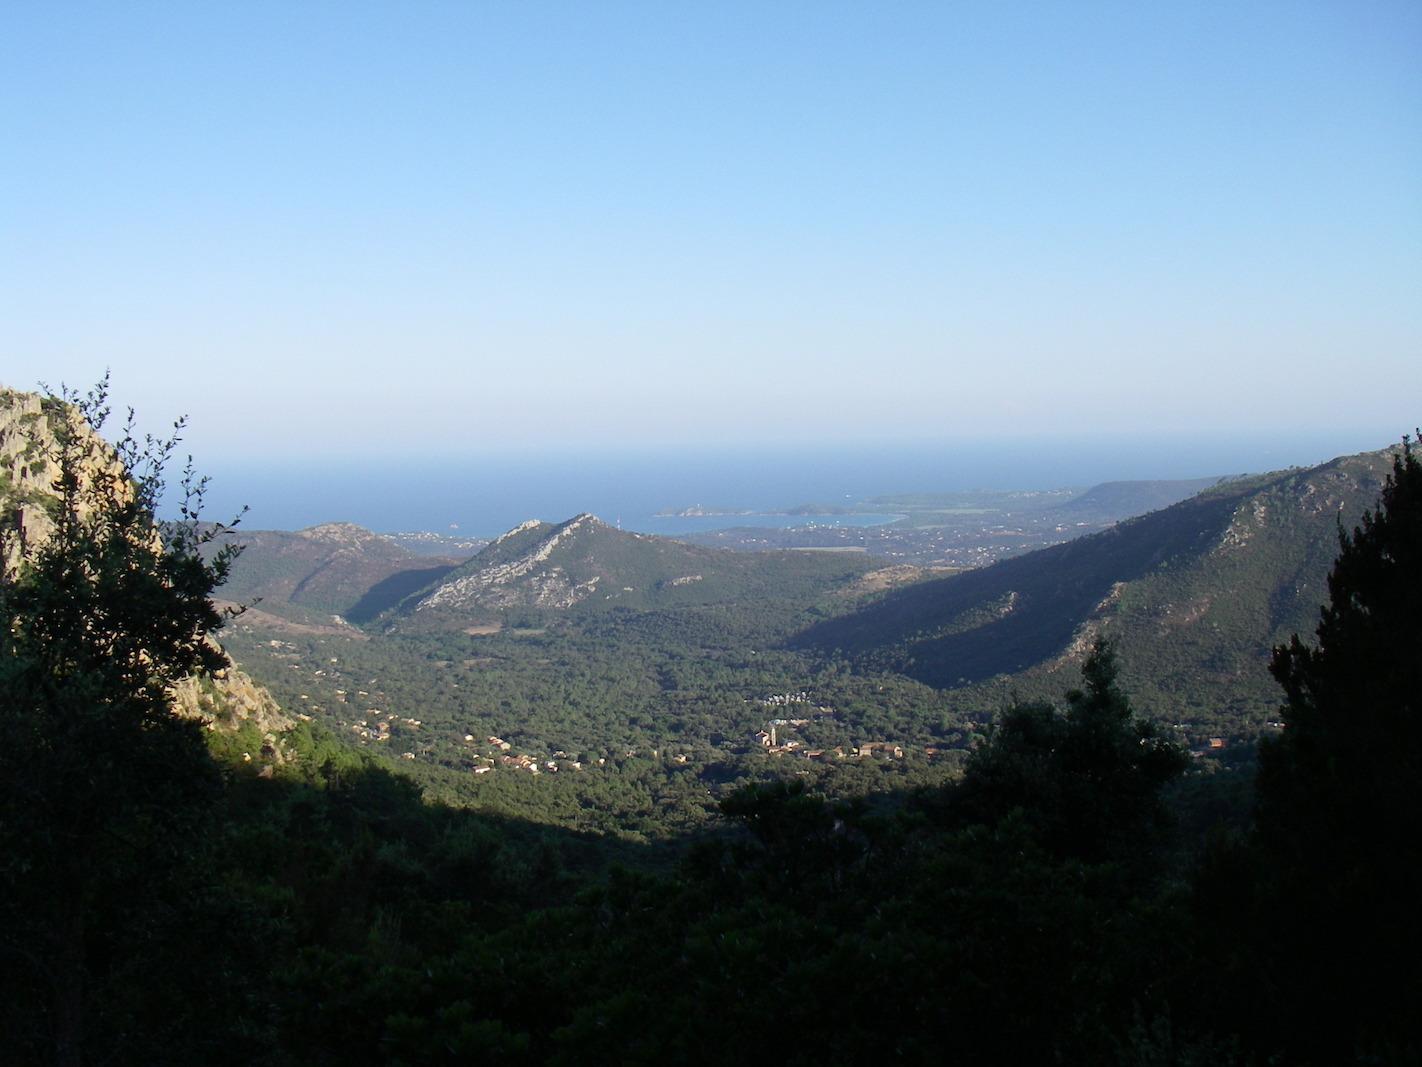 Ausblick auf das Ziel Conca